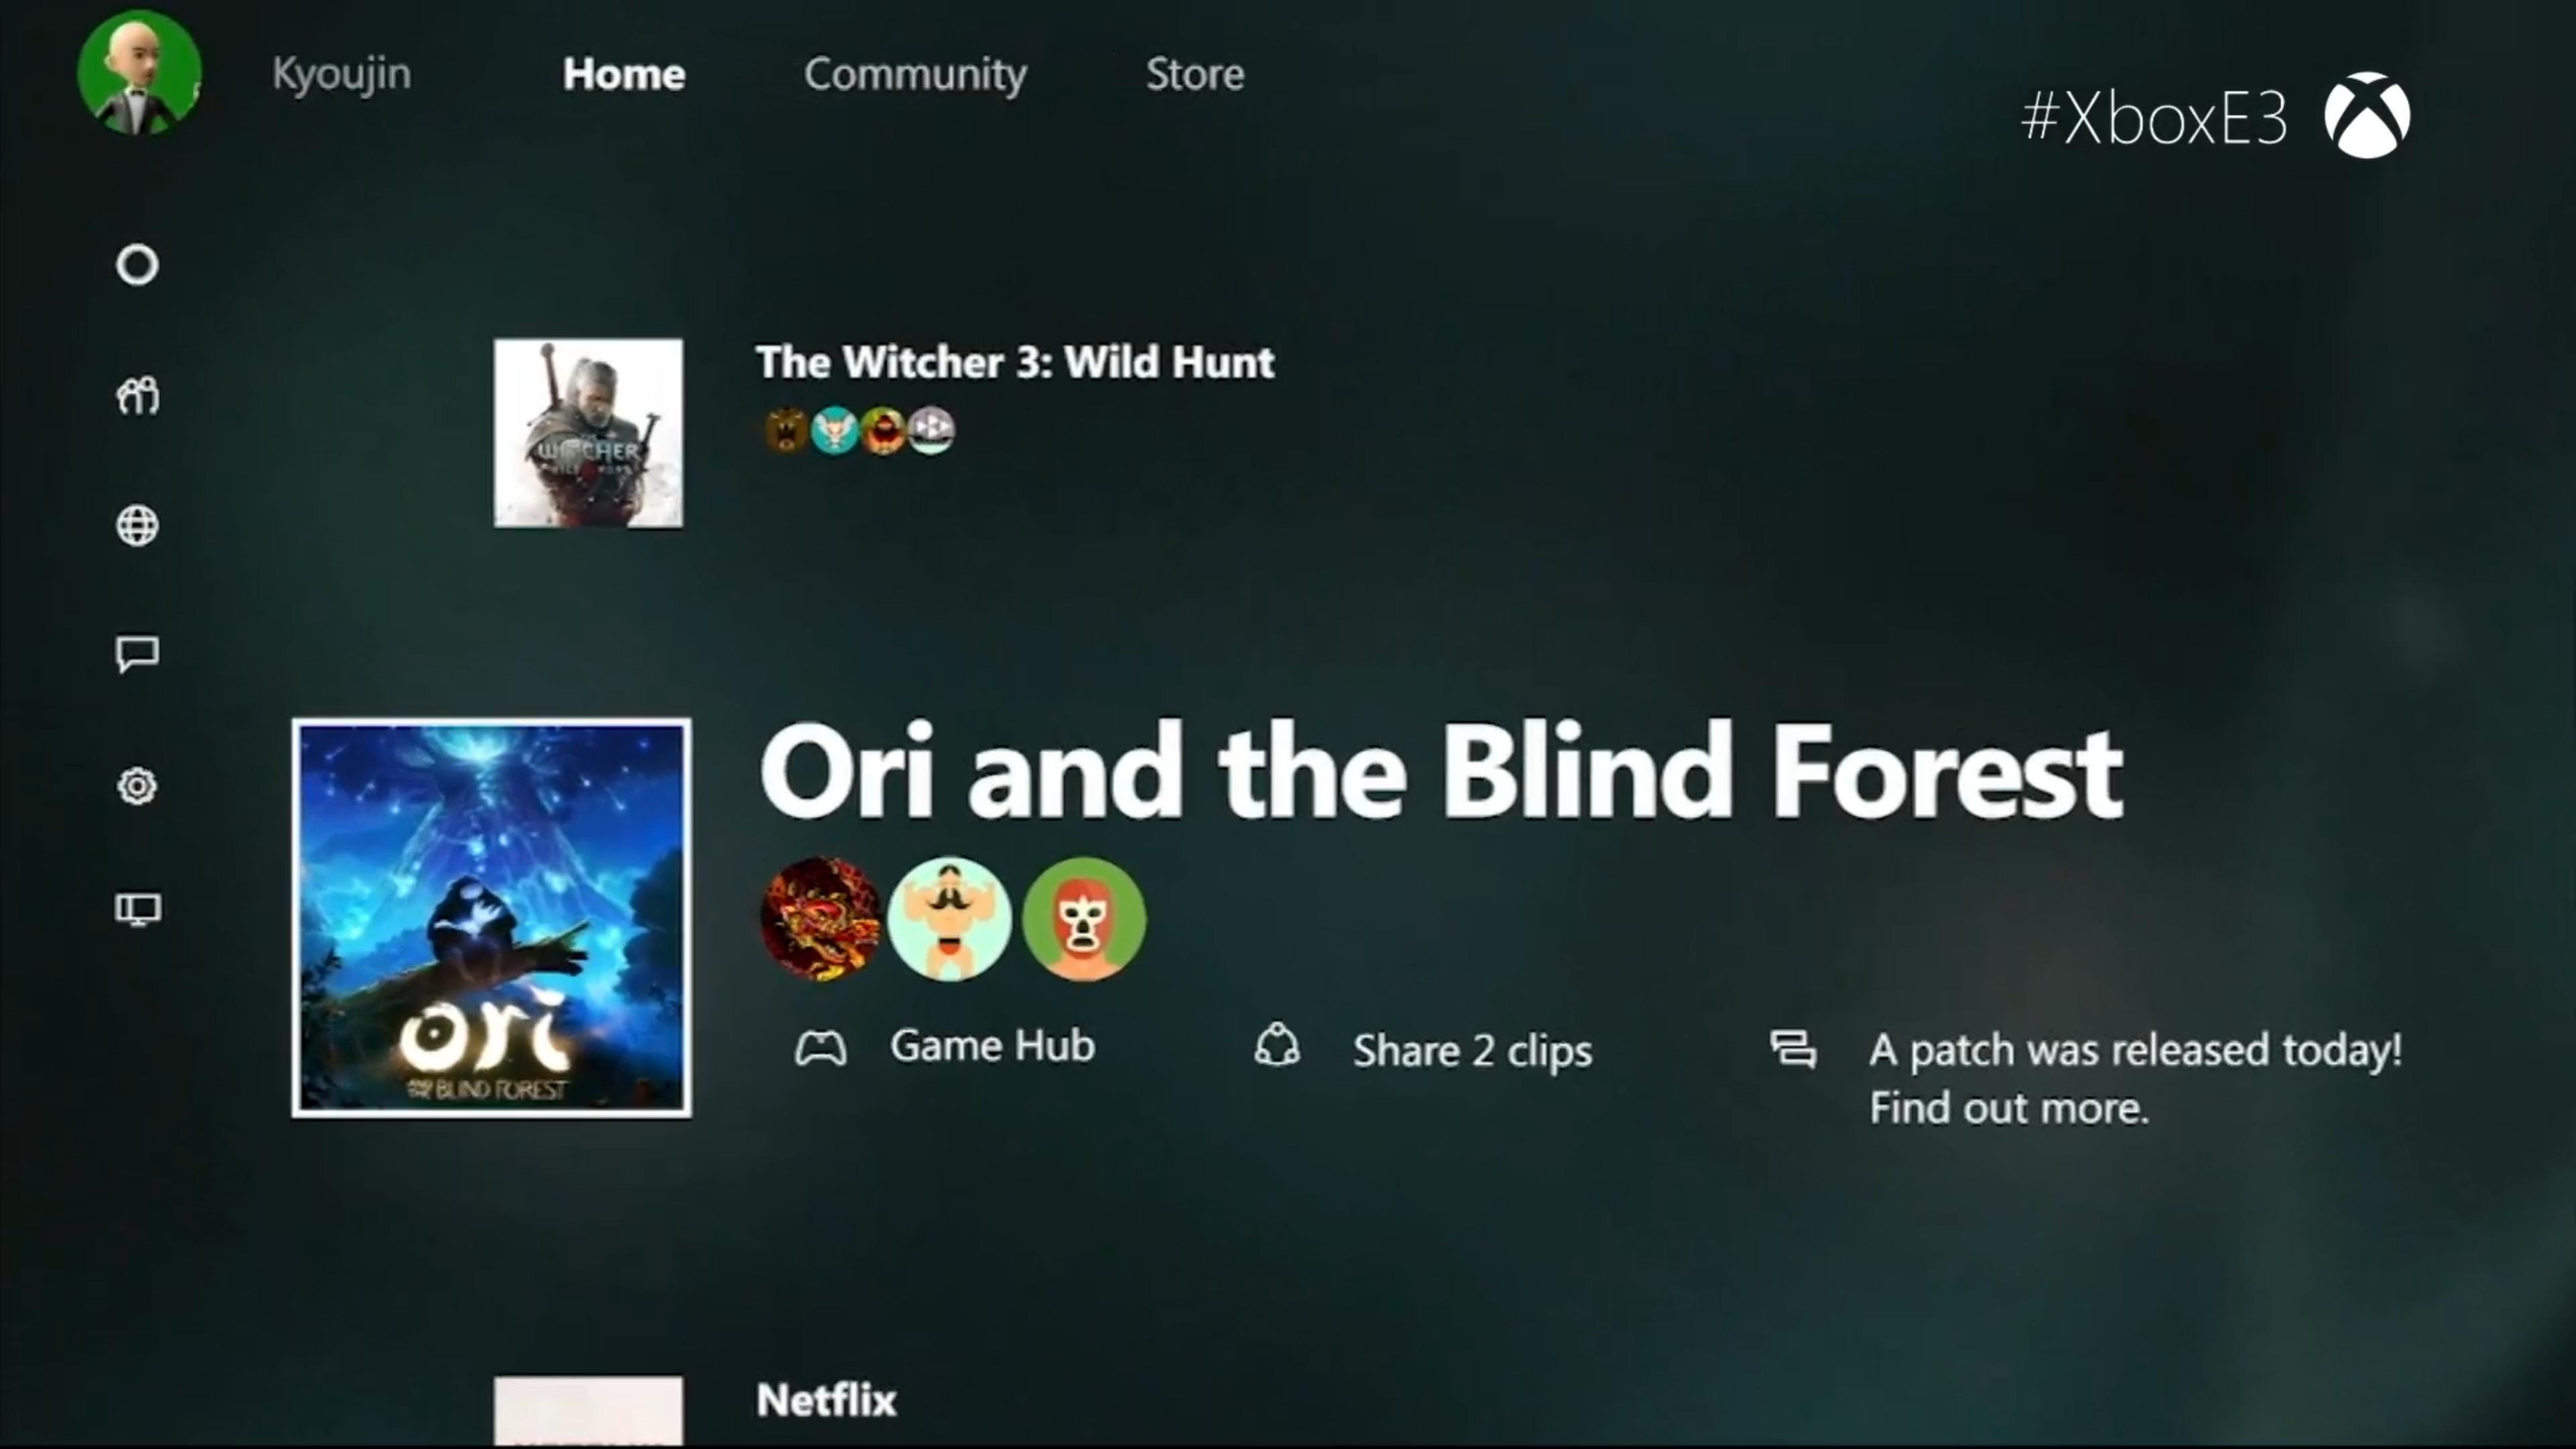 Xbox Windows 10 Share